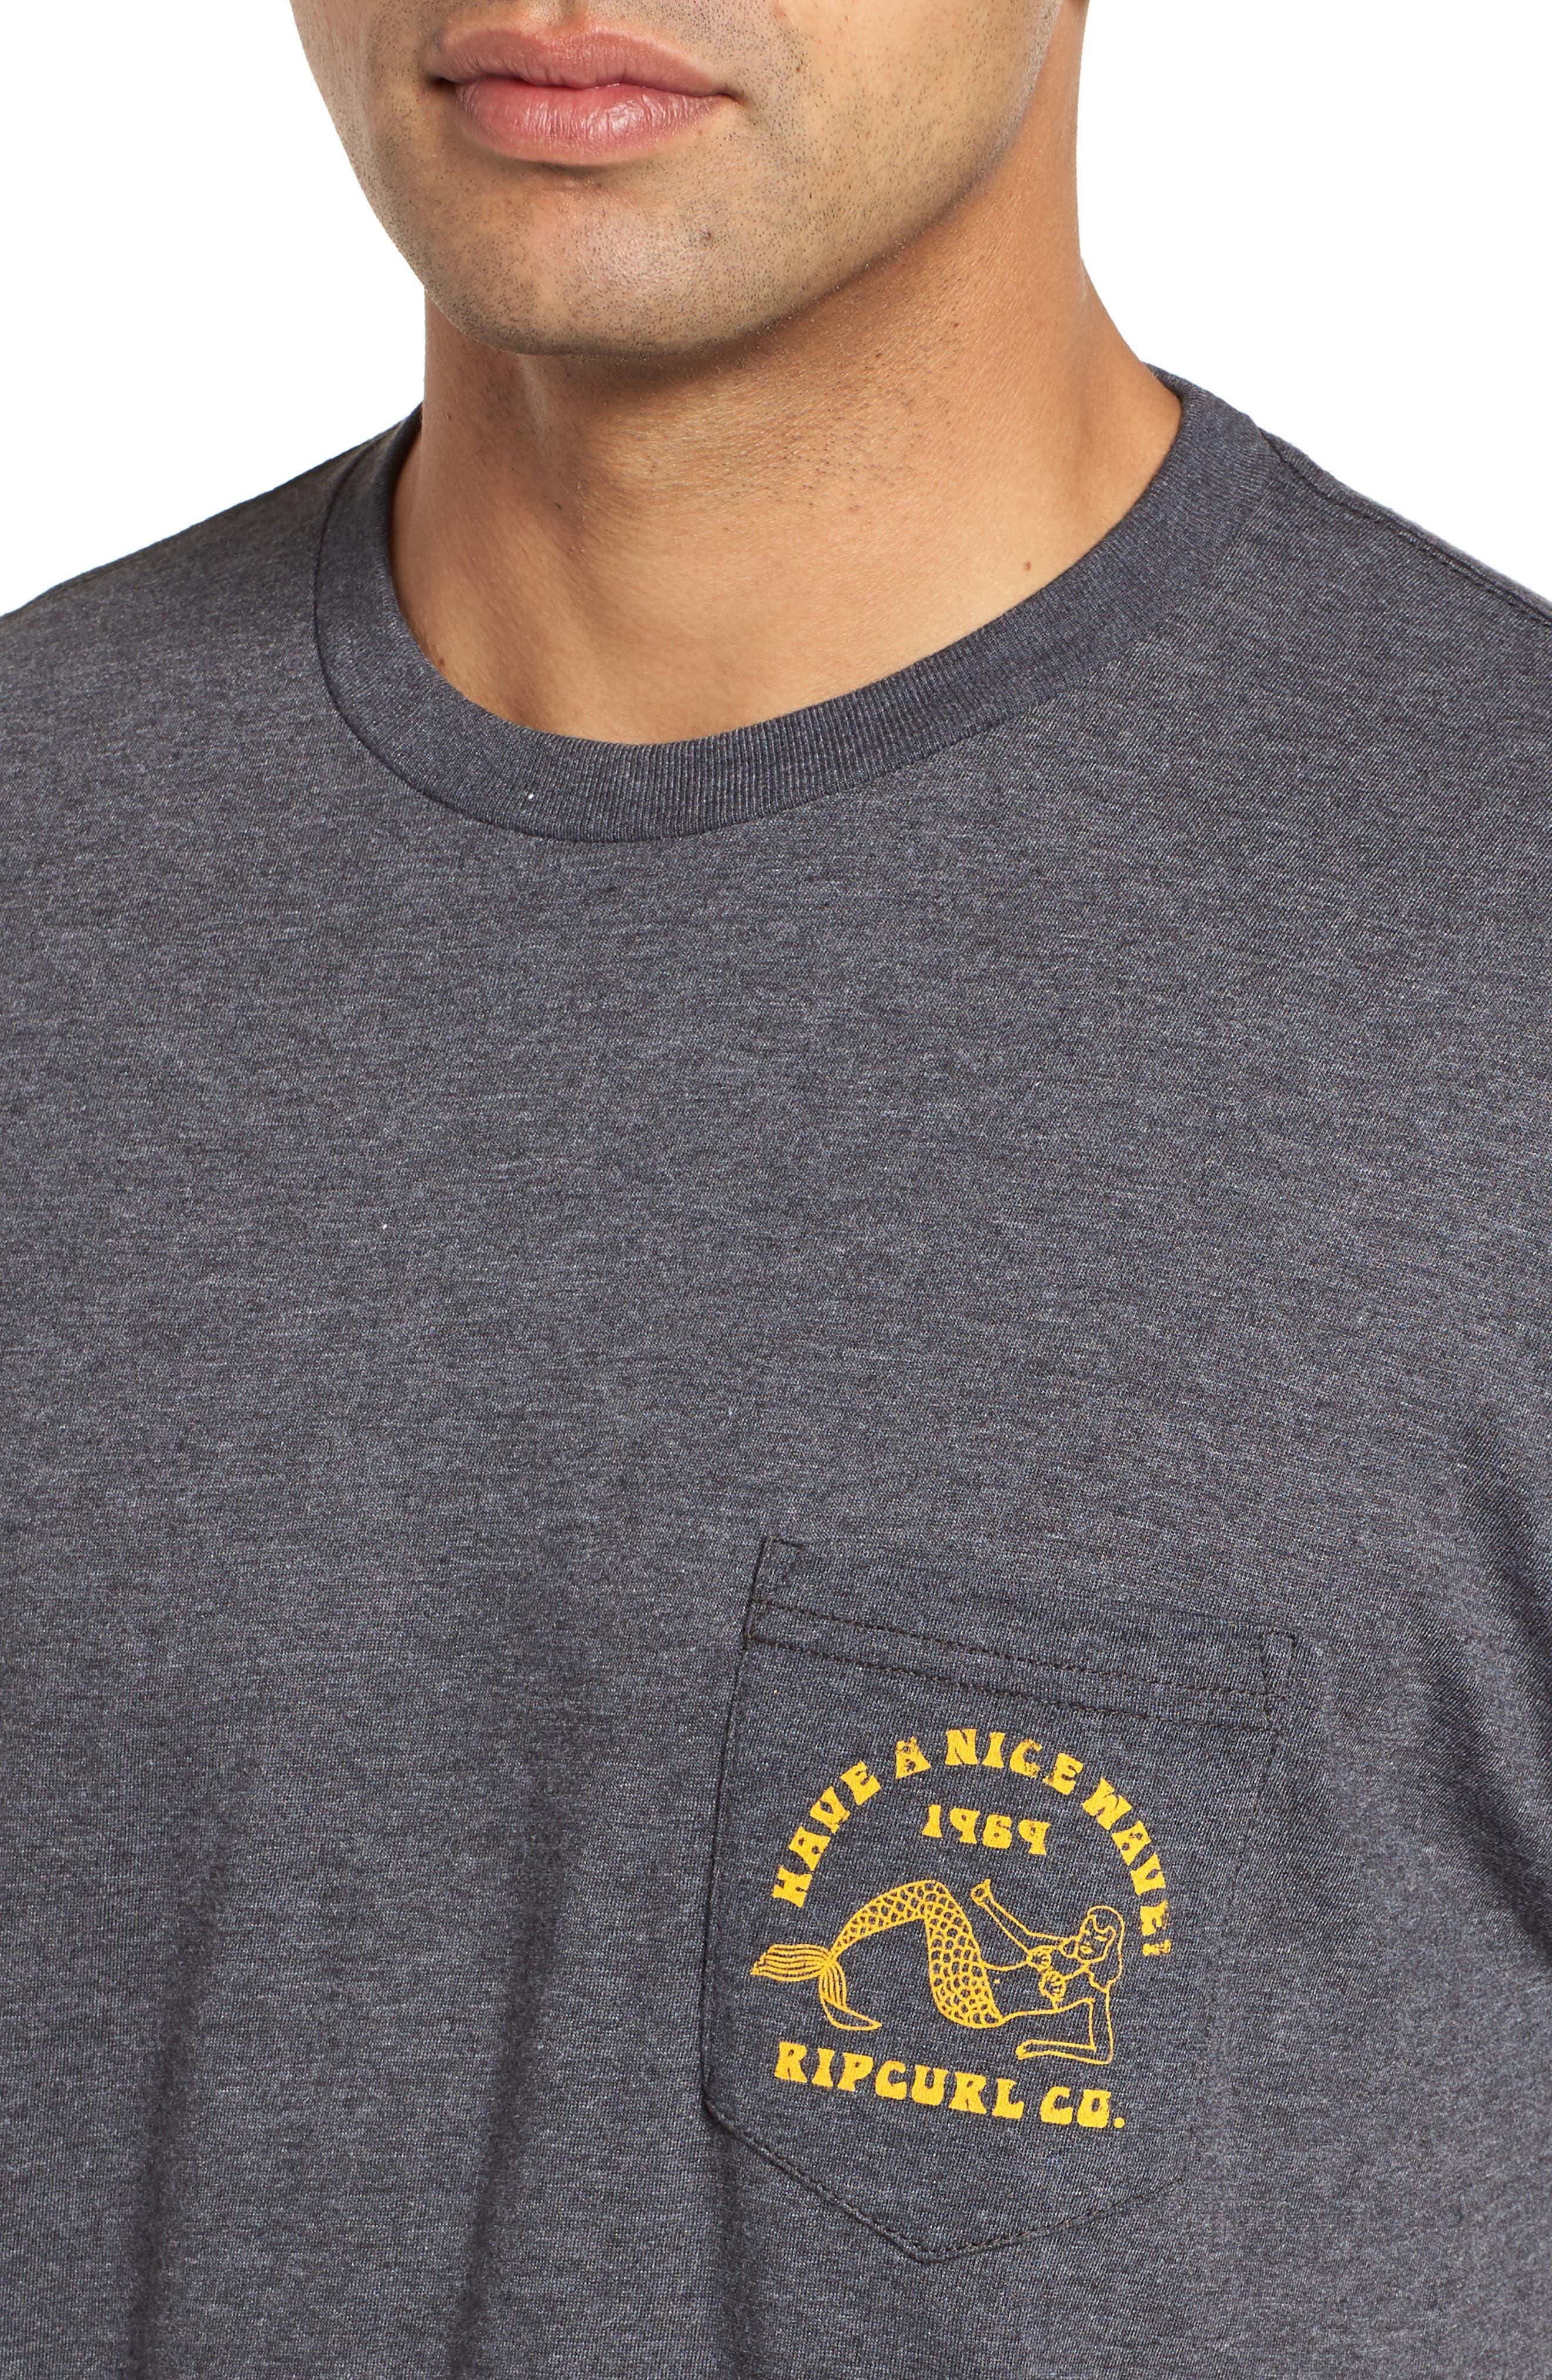 Merman Heathered Pocket T-Shirt,                             Alternate thumbnail 4, color,                             020